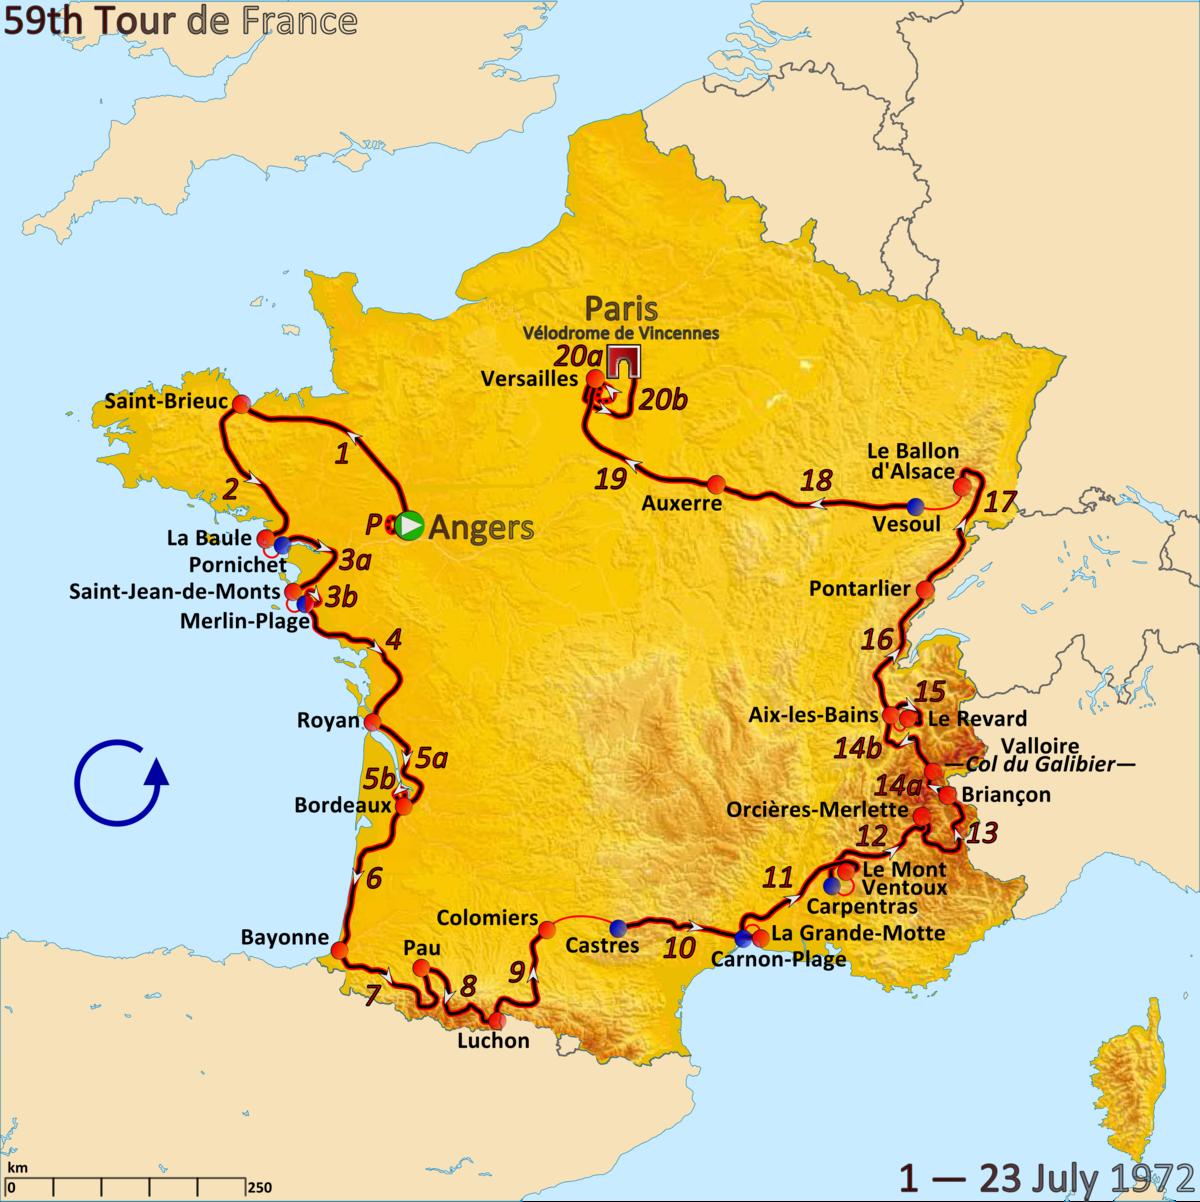 1972 Tour de France - Wikipedia